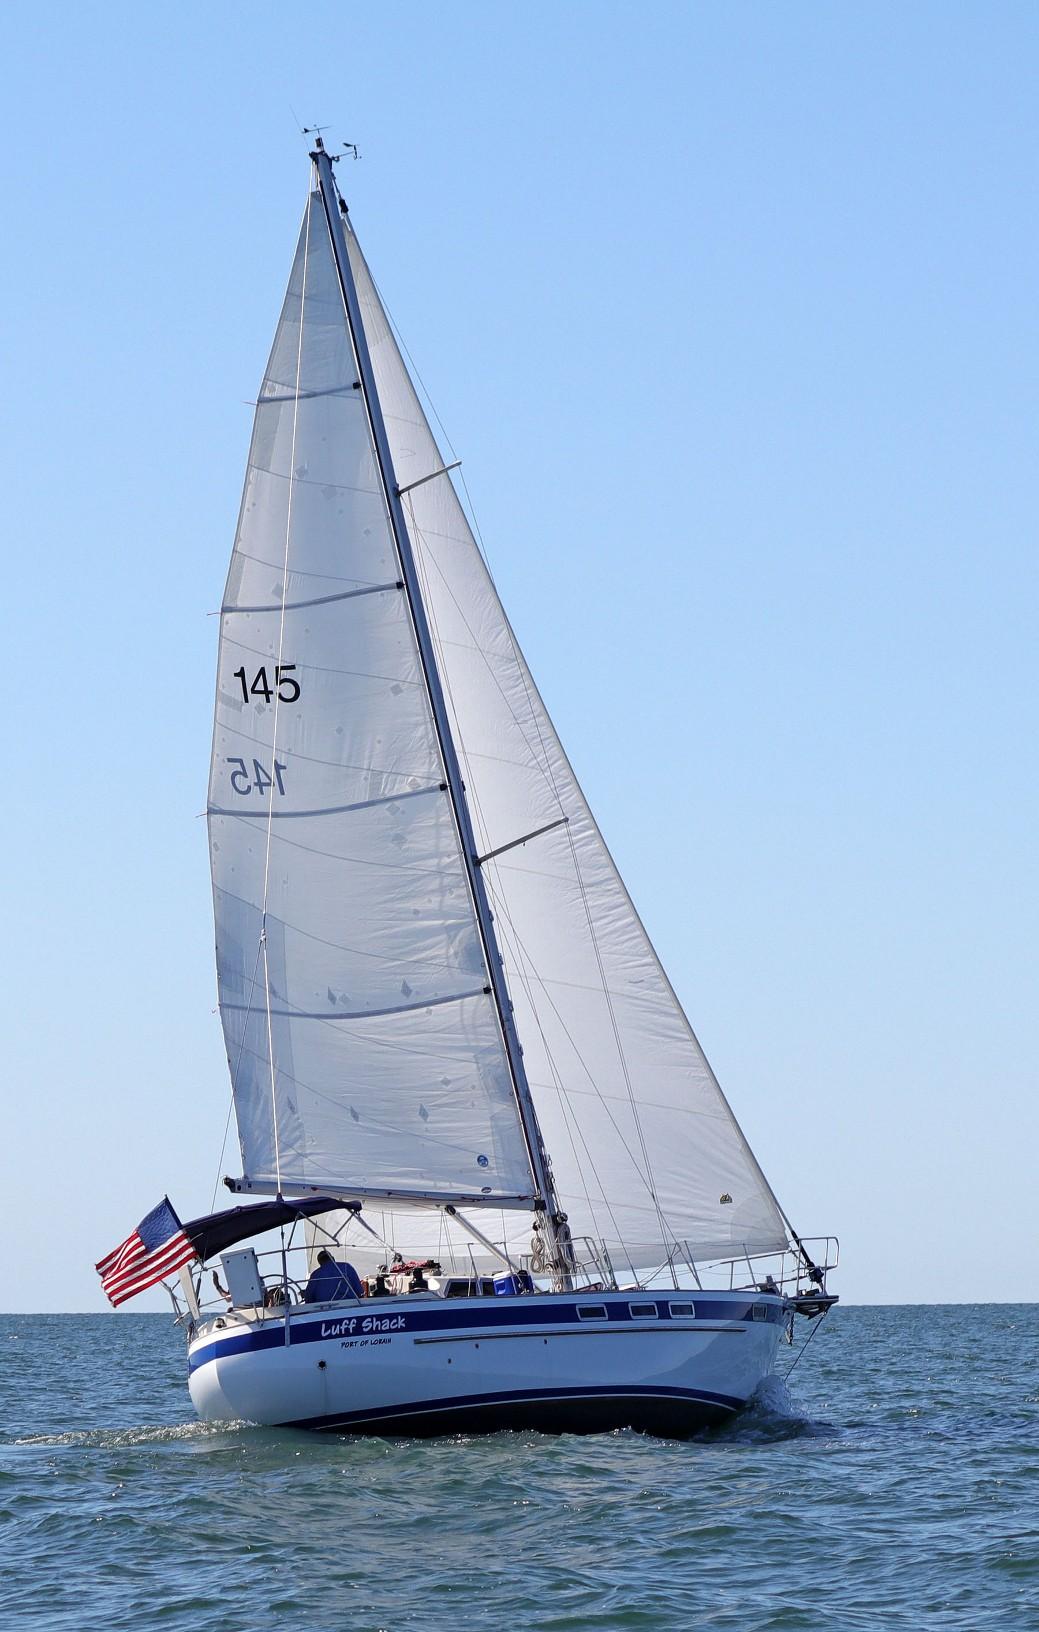 145 - Luff Shack - 2021 qtr